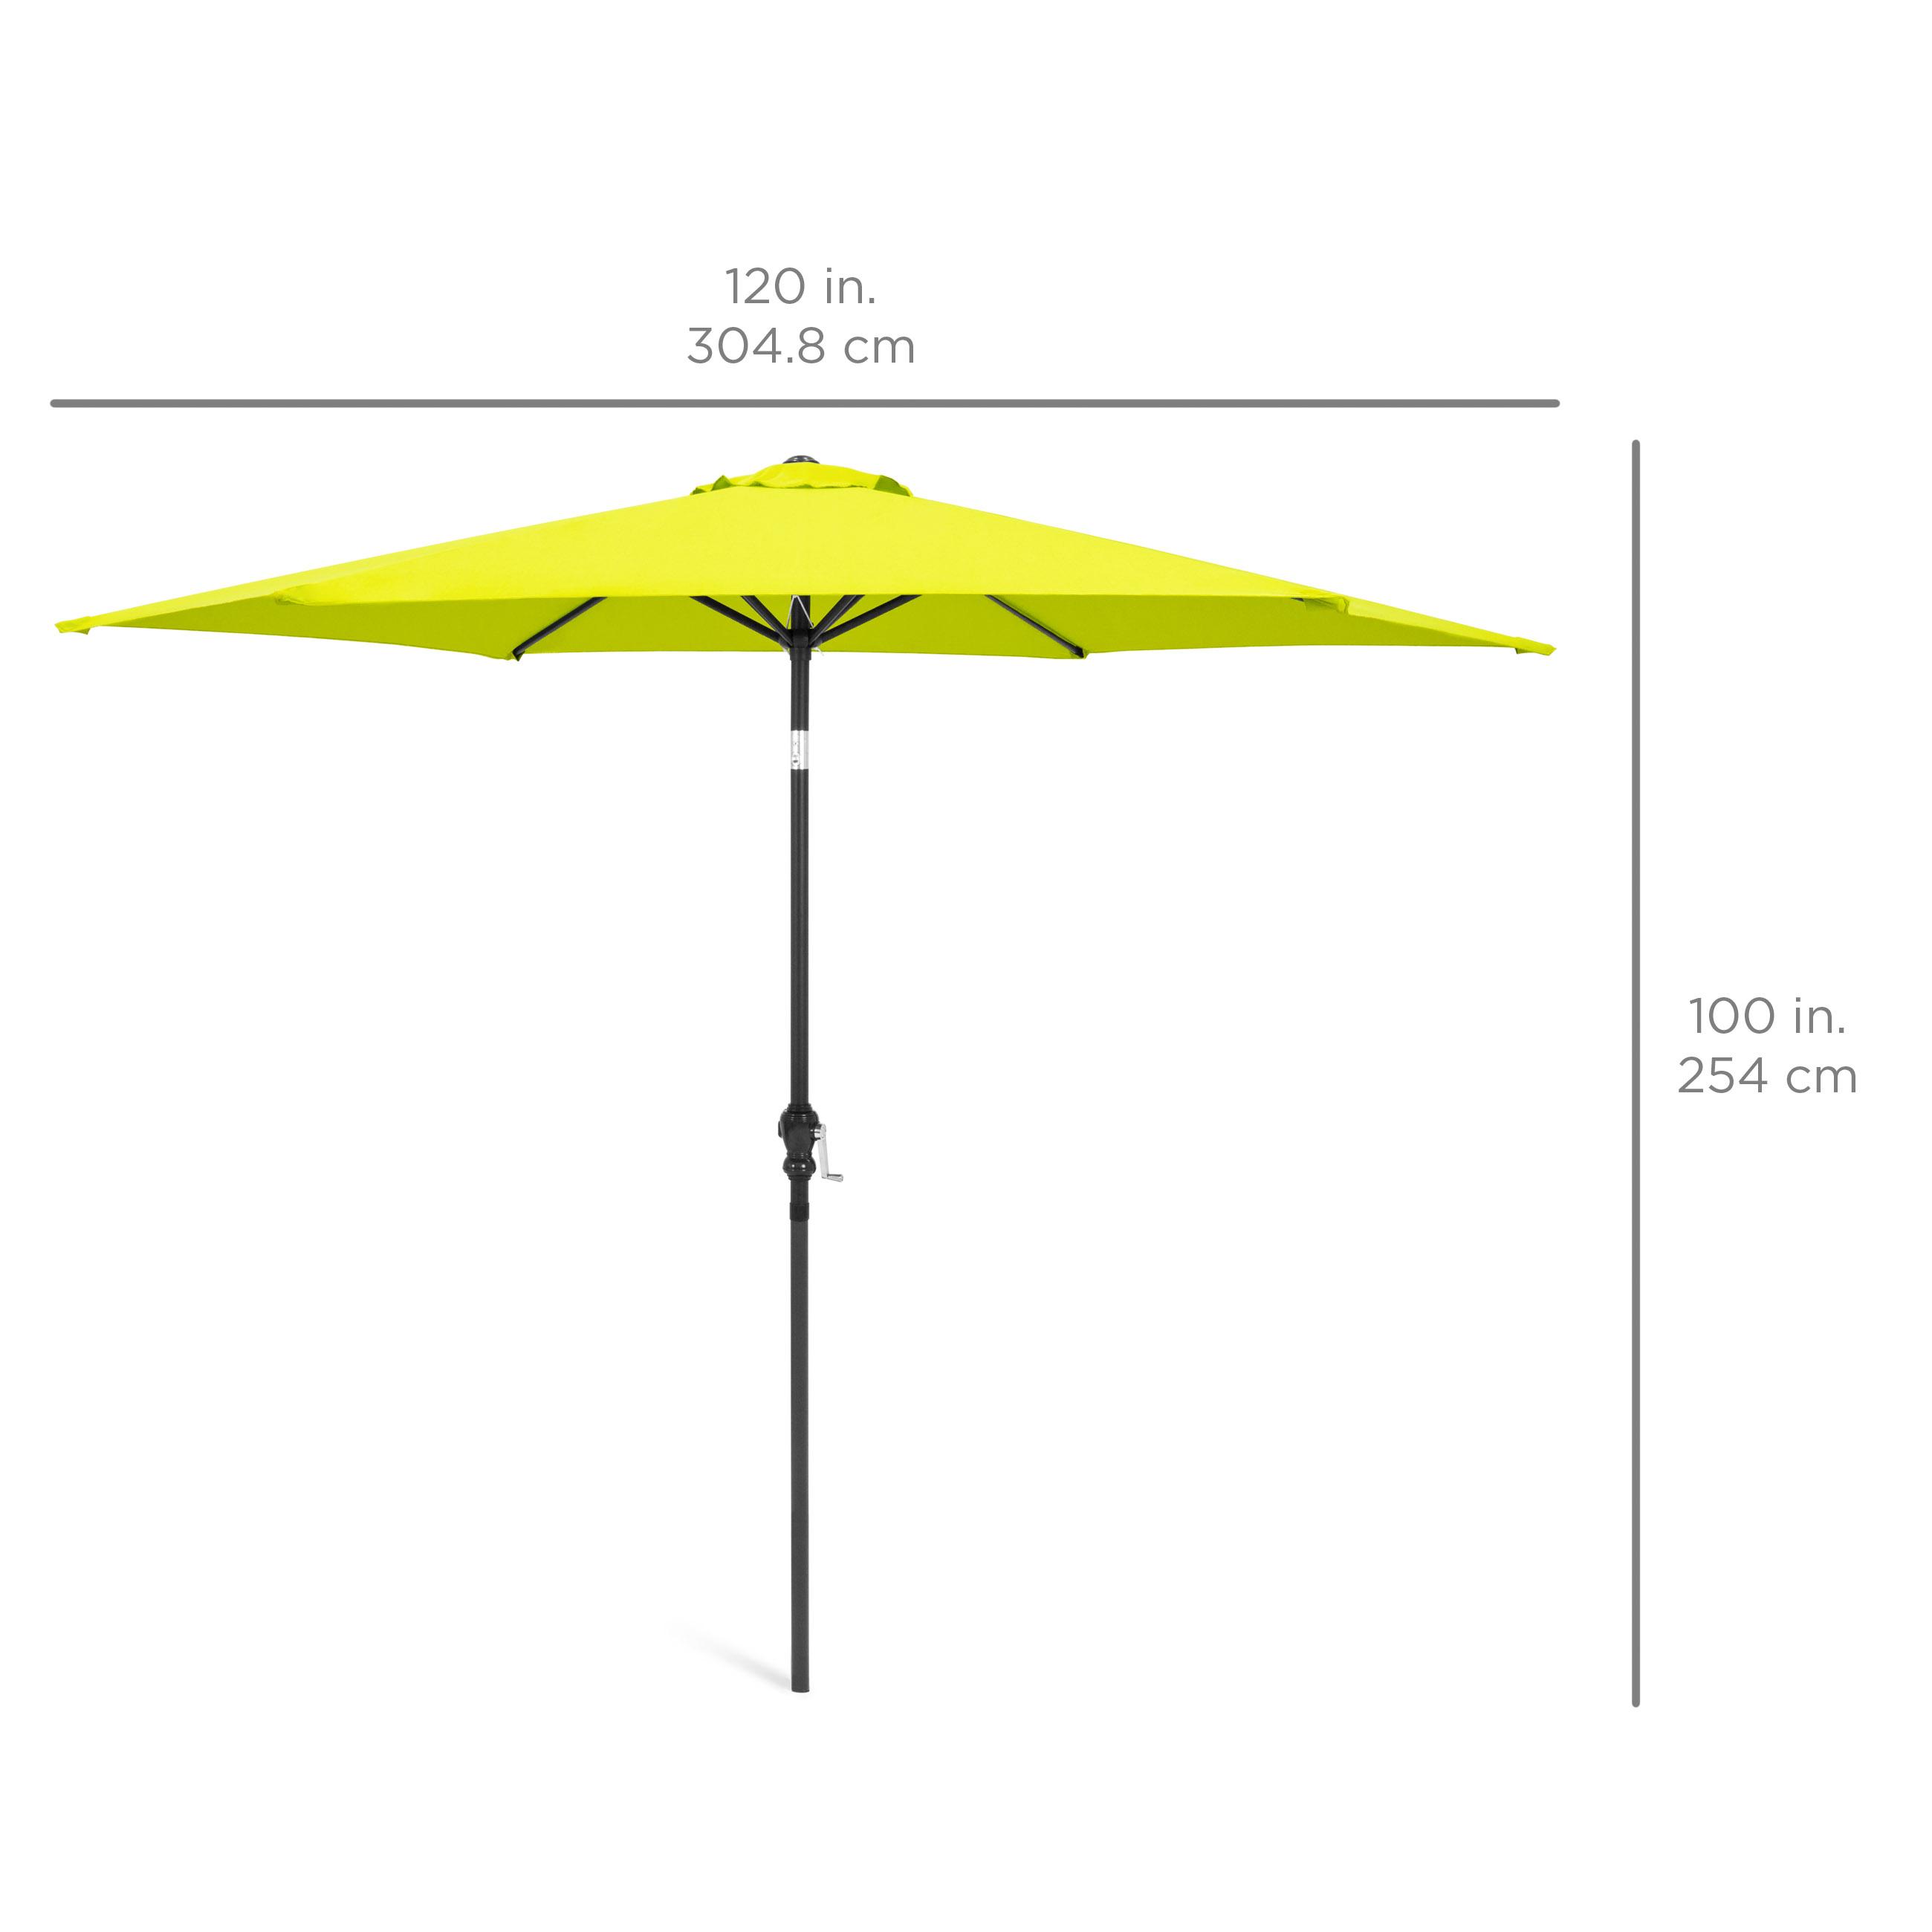 BCP-10ft-Outdoor-Steel-Market-Patio-Umbrella-Decoration-w-Tilt-Crank thumbnail 49